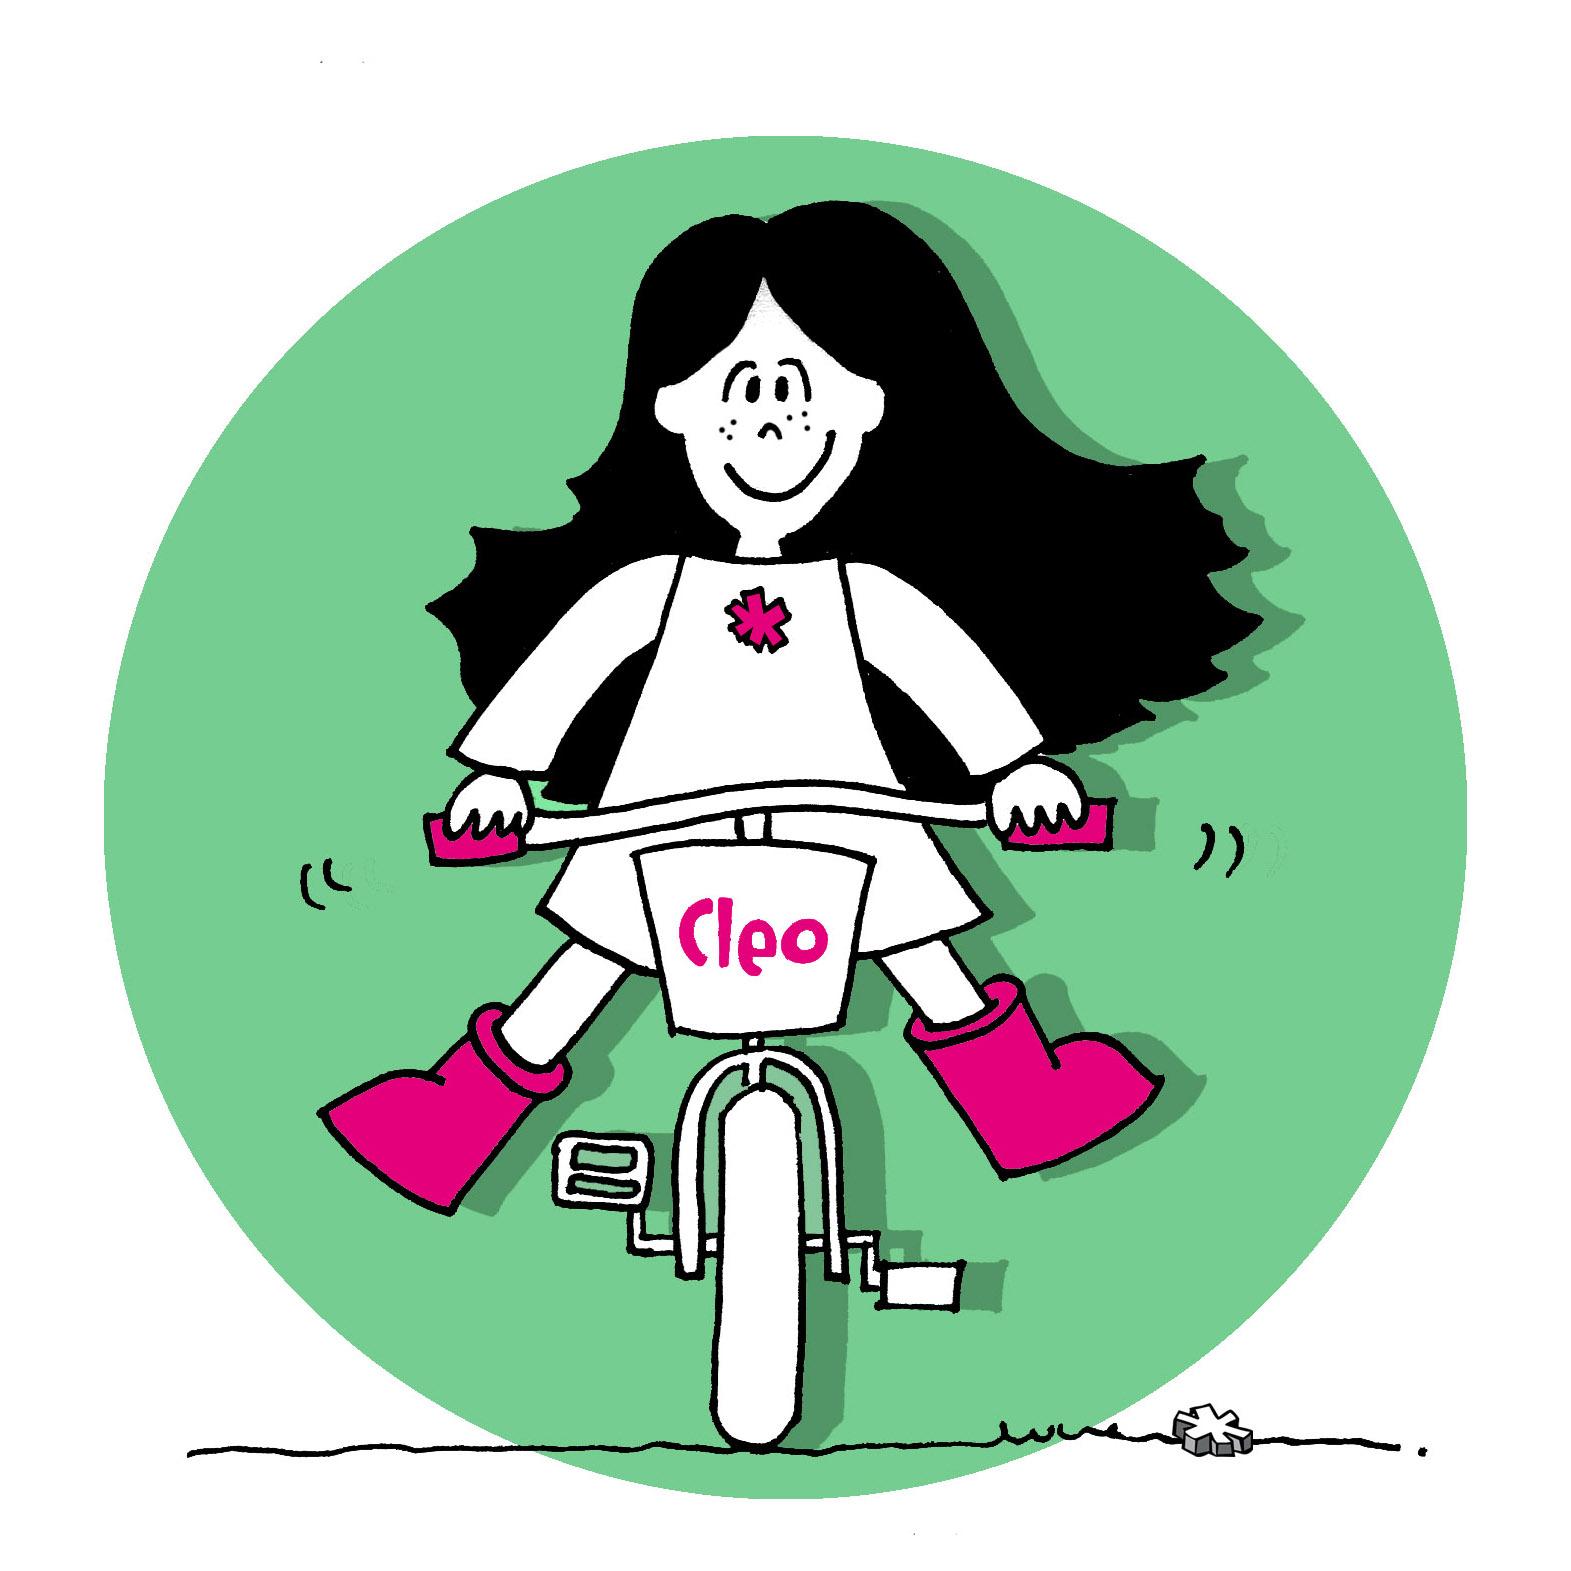 Lux en Bici (Cleo)